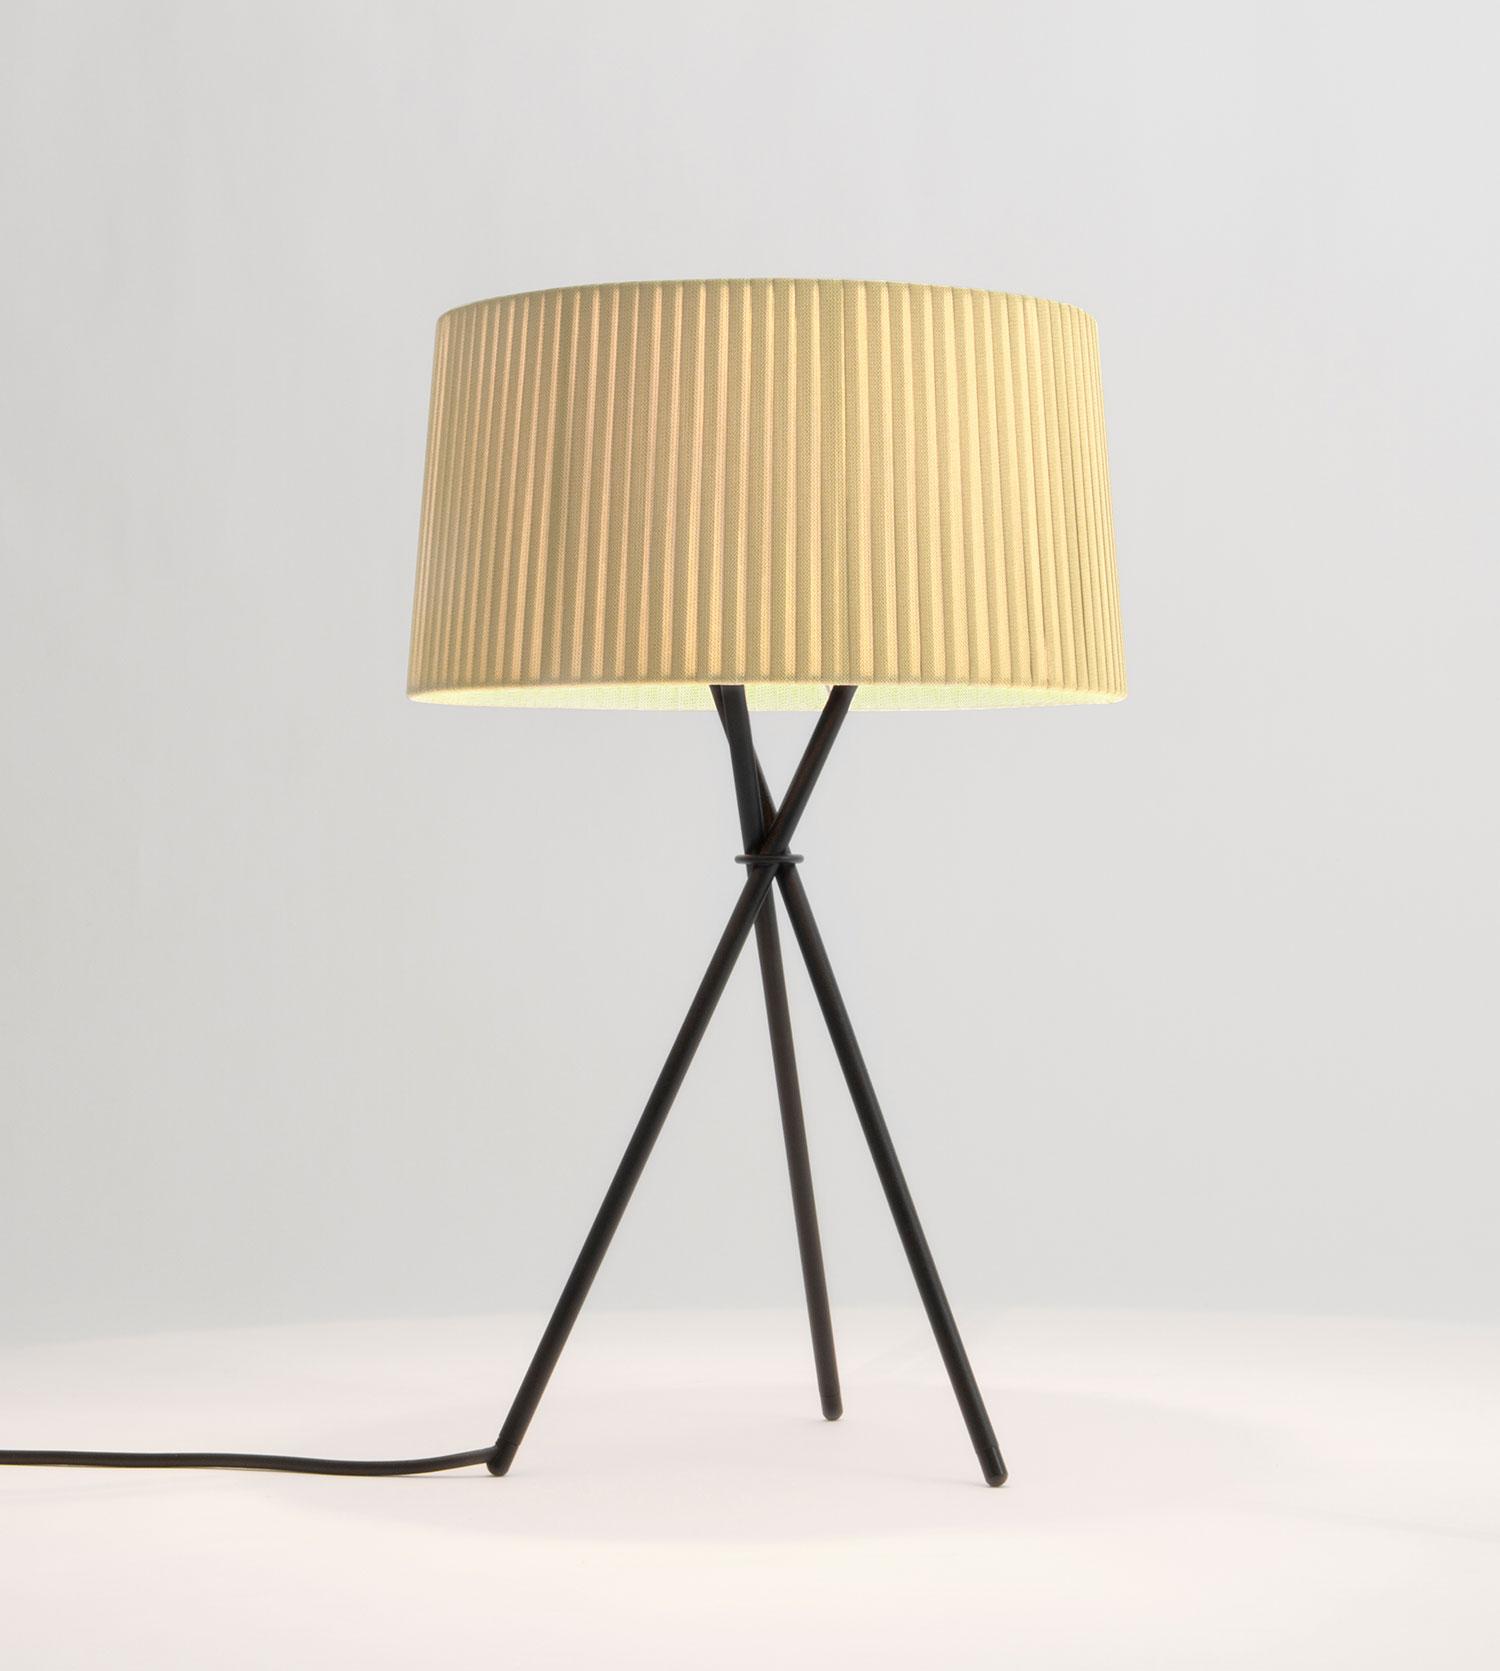 SANTACOLE_TABLE_LAMPS_Tripode_M3___Tripode_G6_Tripode_M3_Costa__Clara_10-web.jpg